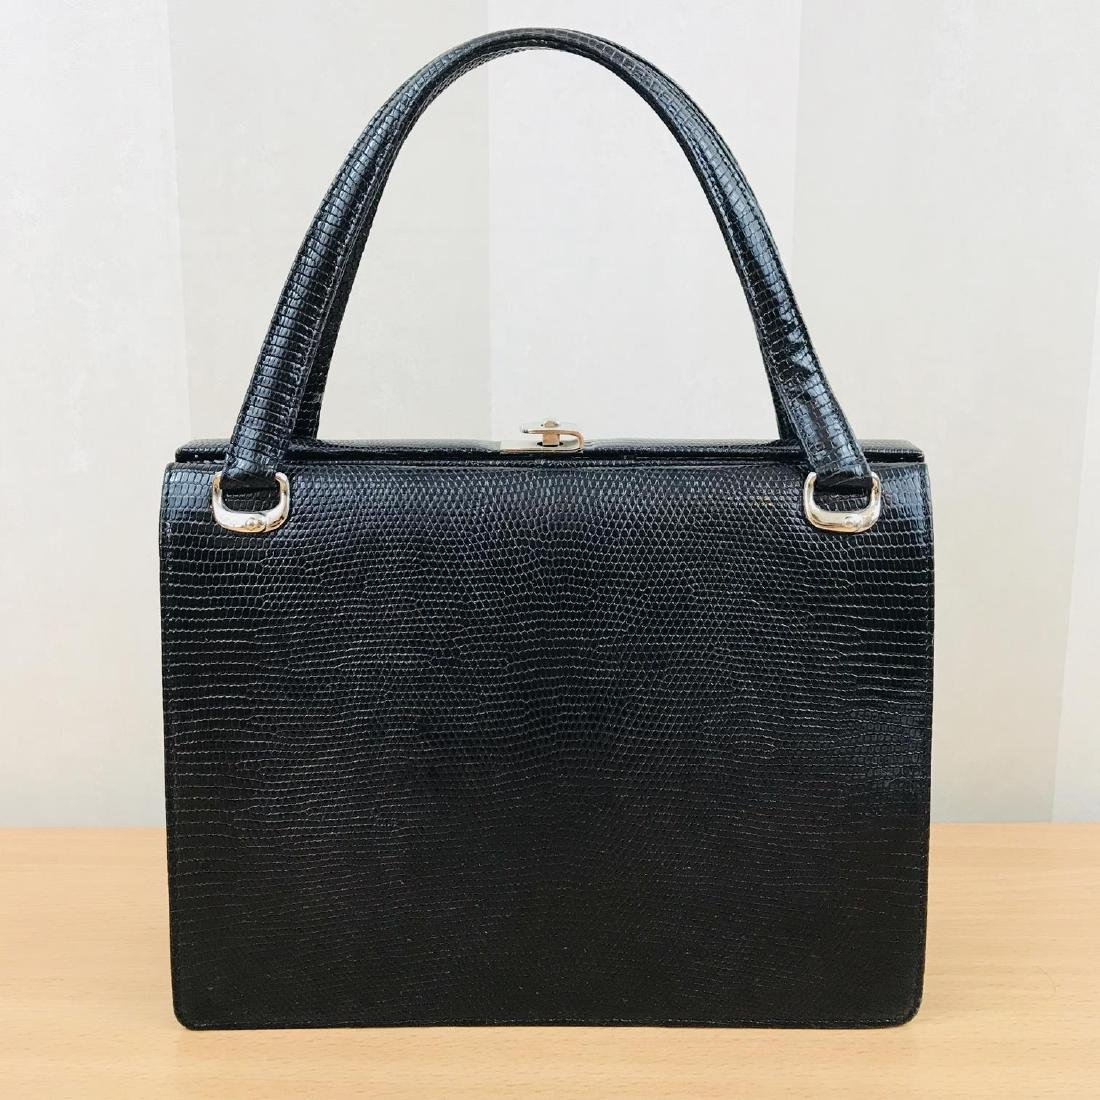 Vintage Handmade Genuine Python Leather Handbag